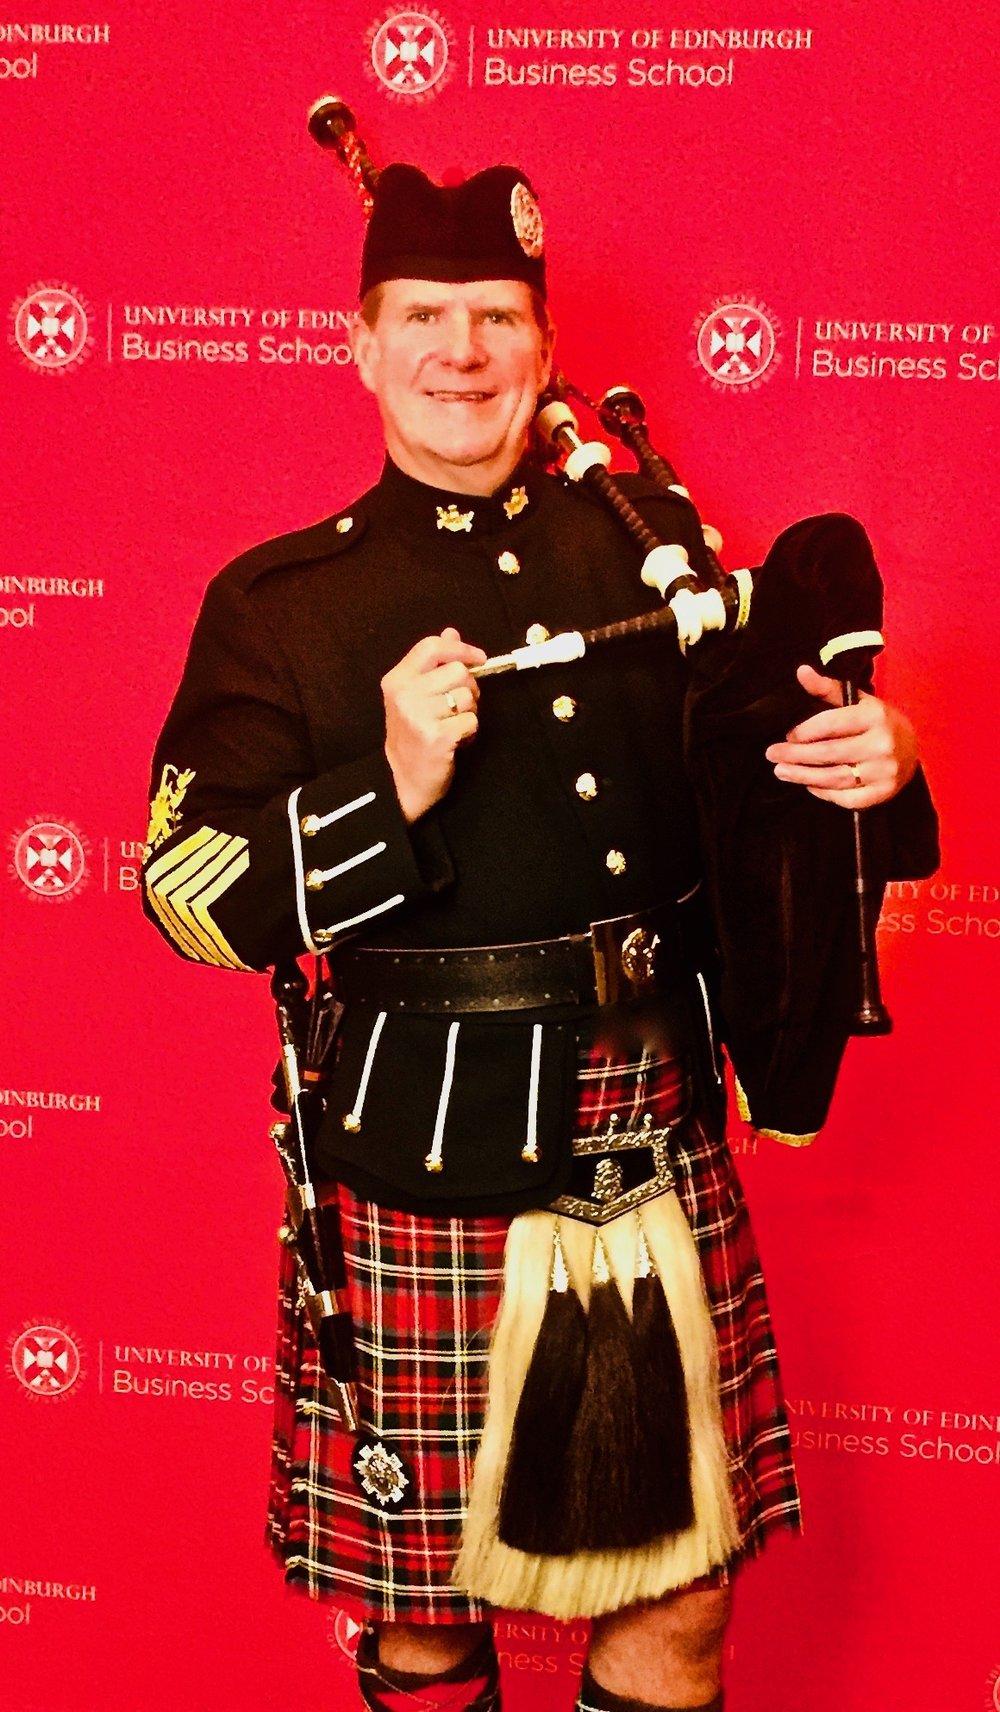 A few pics from the University of Edinburgh Business Studies winter graduation awards